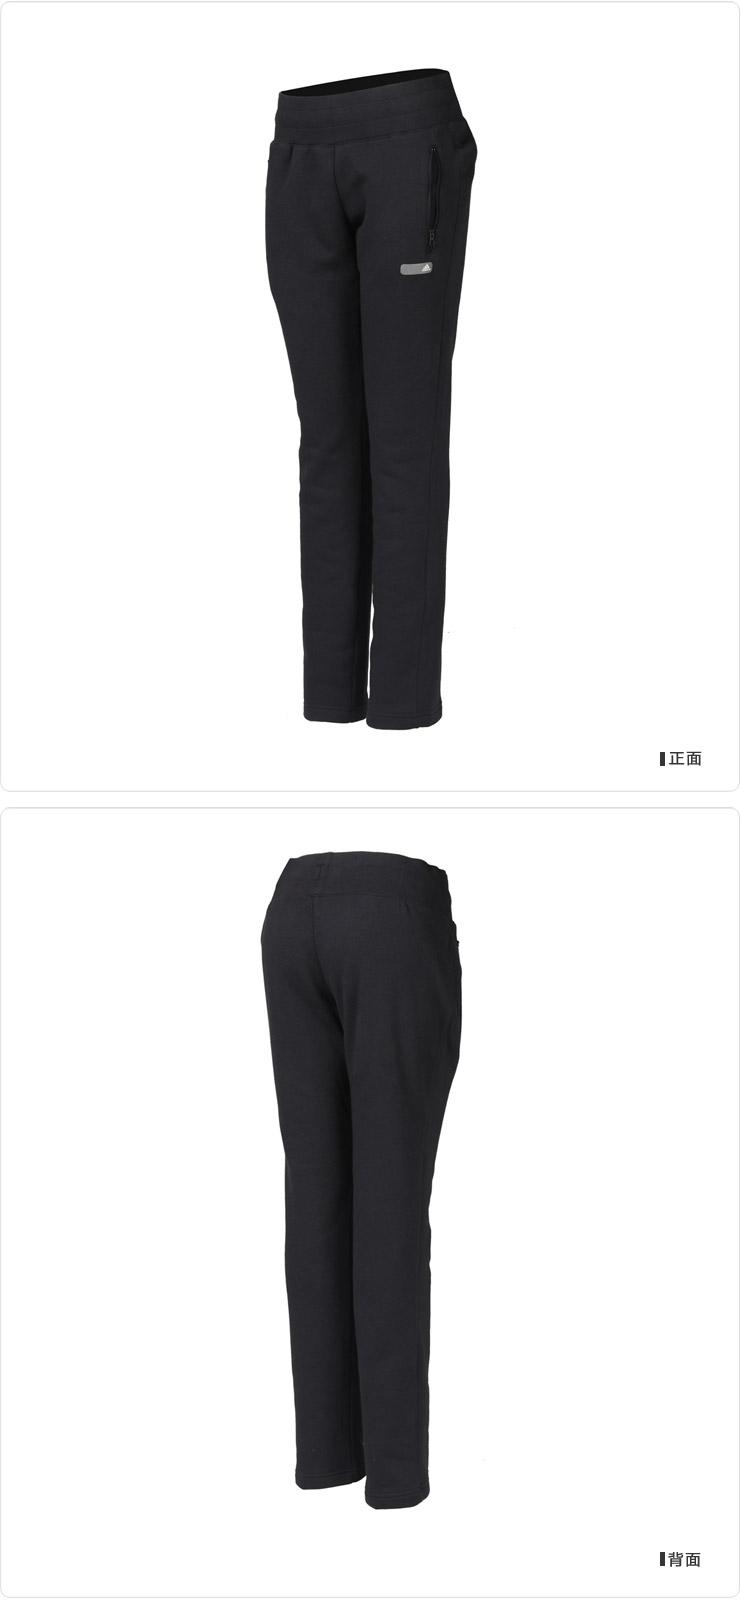 adidas阿迪达斯女裤女款运动裤子休闲长裤w59853w59850